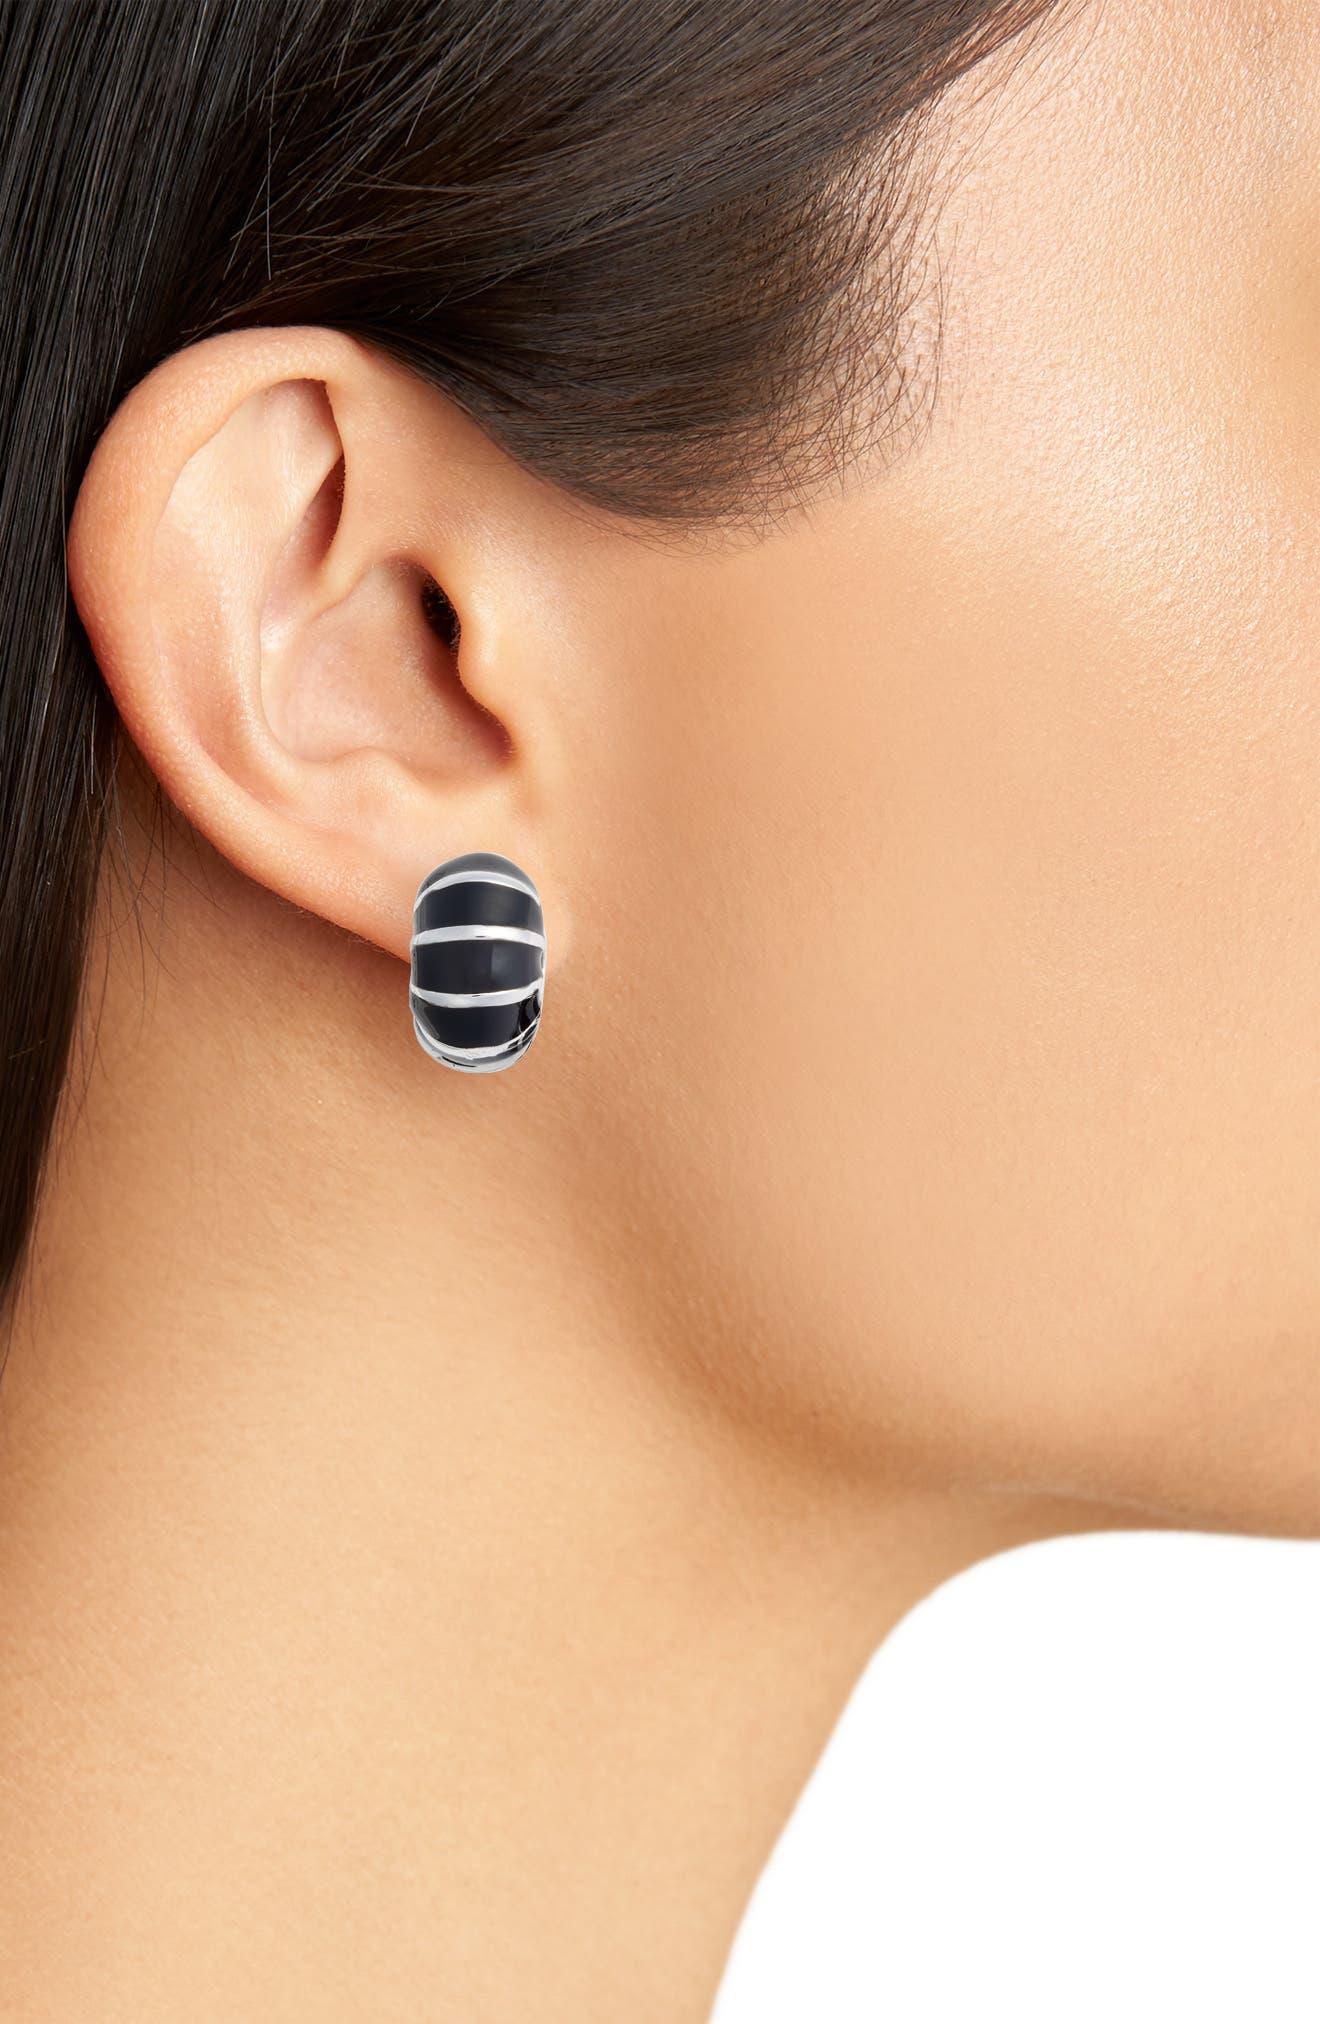 ERWIN PEARL,                             Stripe Black Segmented Hug Earrings,                             Alternate thumbnail 2, color,                             BLACK